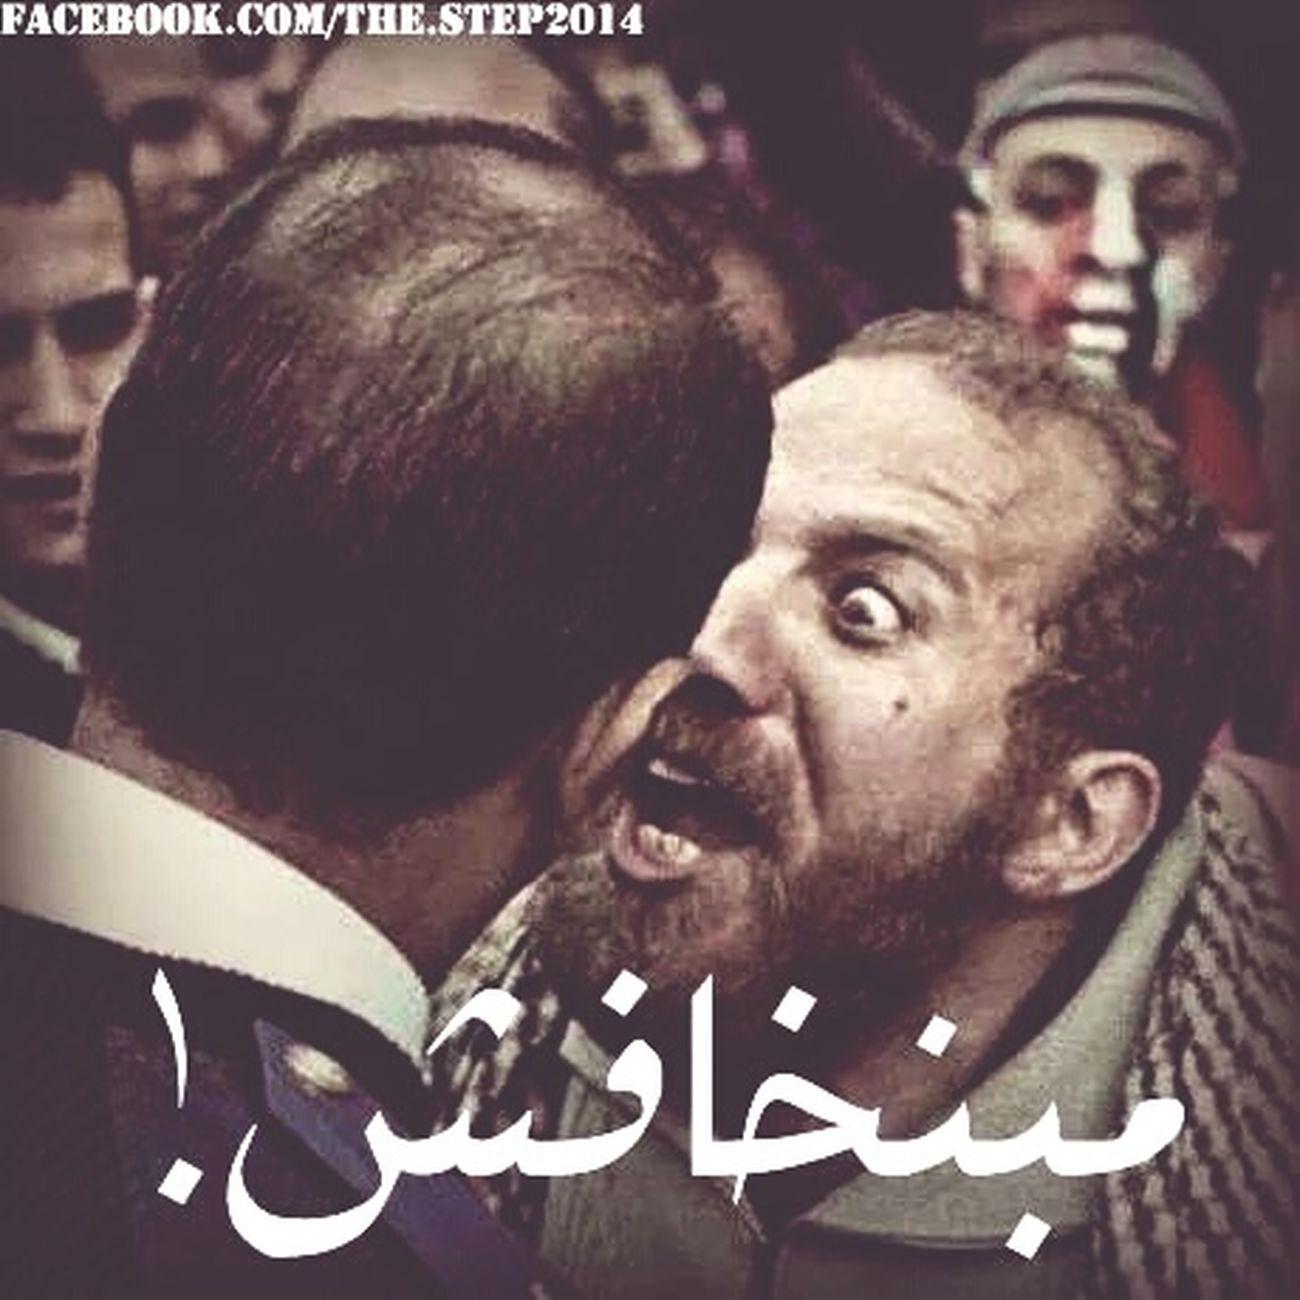 يا حكومة خافى مننا we hear your fear Revolution Egypt 25jan Fearless